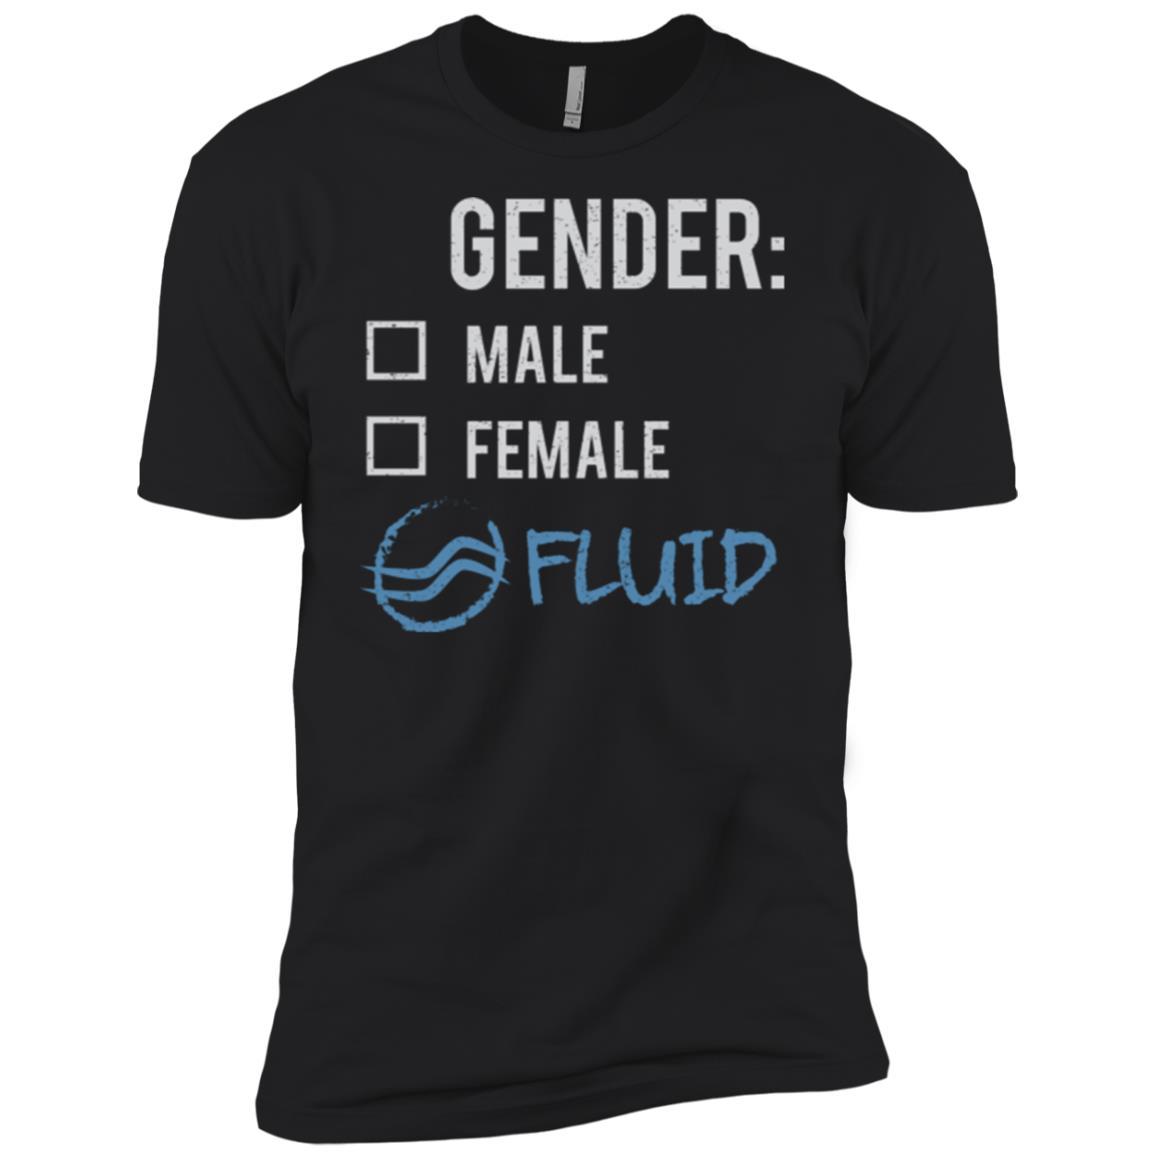 Male Female Fluid Gender Nonbinary Trans Men Short Sleeve T-Shirt